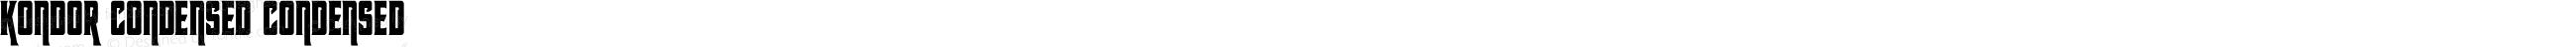 Kondor Condensed